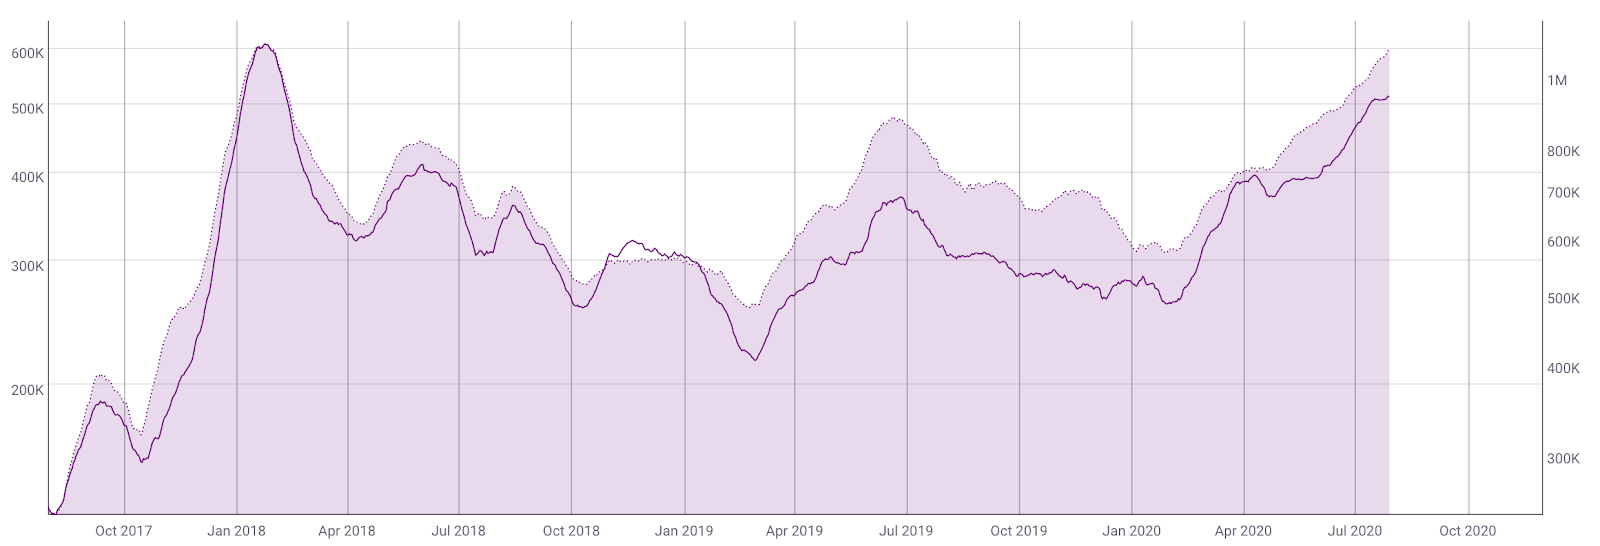 Daily active addresses vs. median Ethereum transaction fee, USD by CoinMetrics